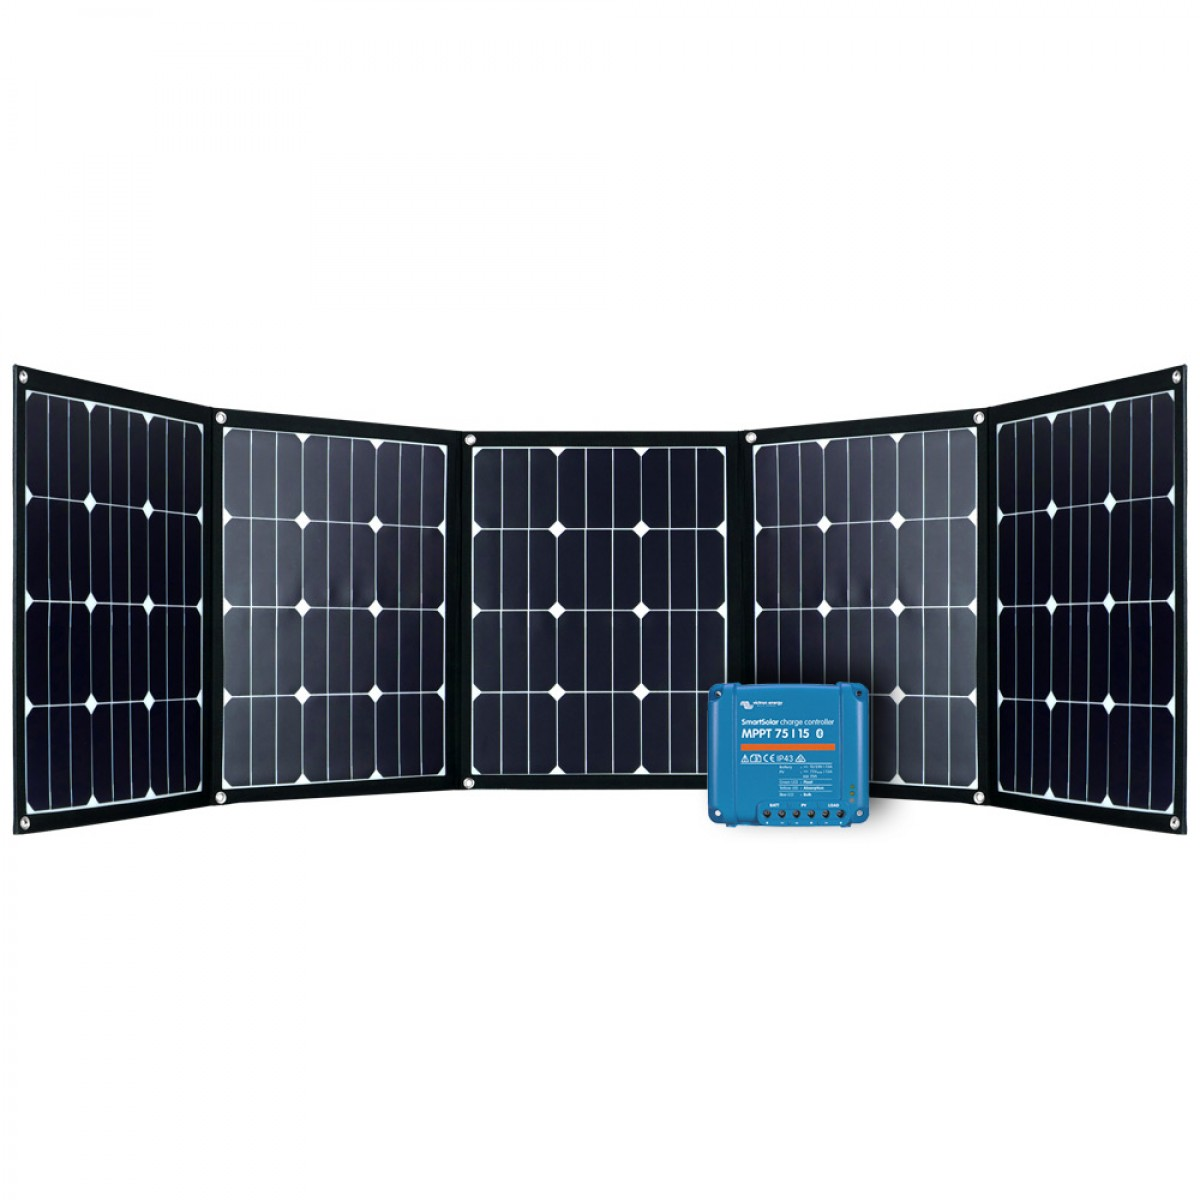 Faltmodul 5x40Wp mit MPPT Solarladeregler 1